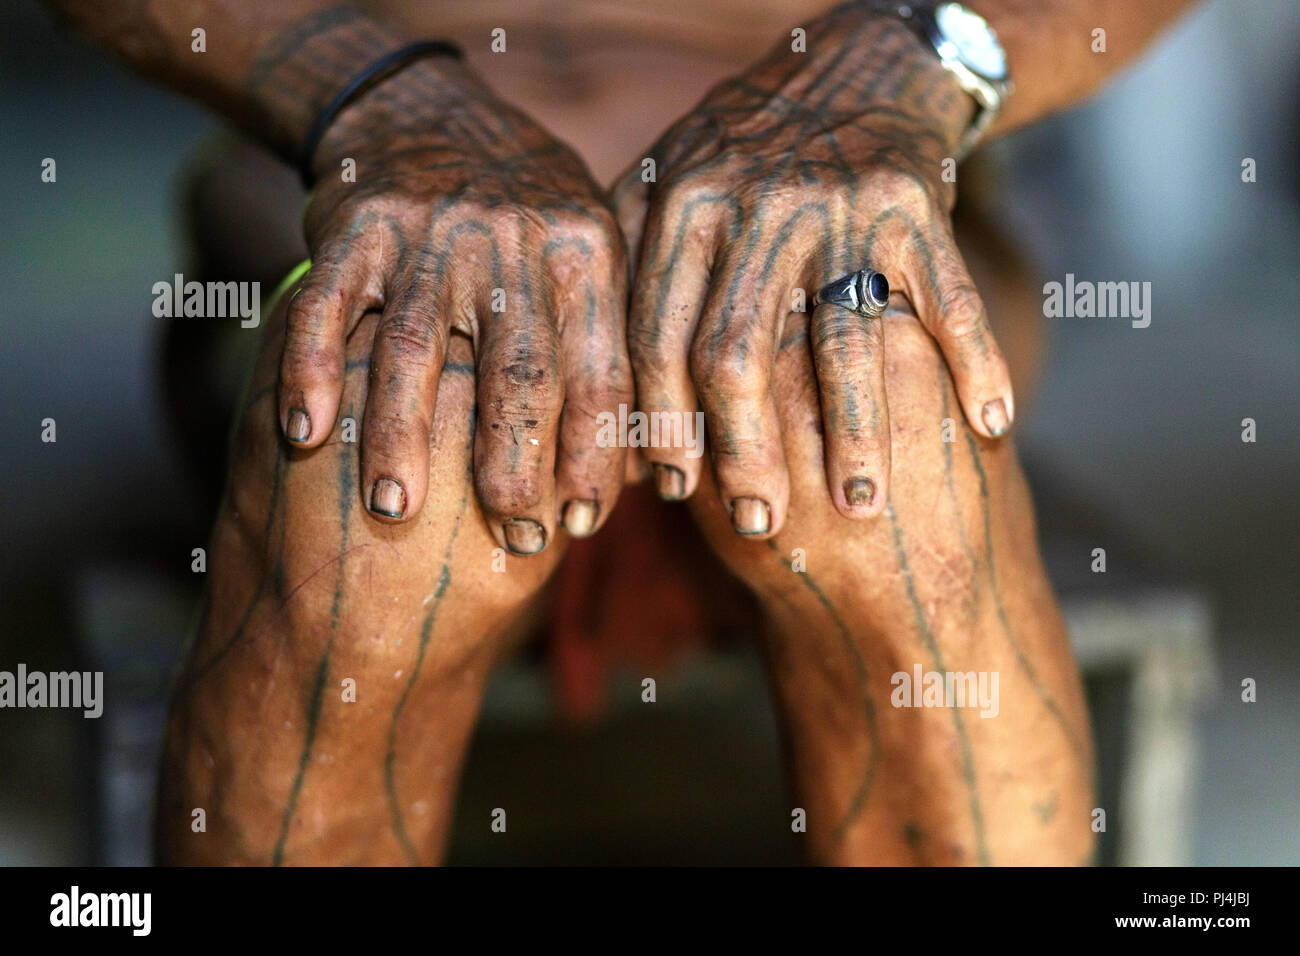 Tatooed hands of an old shaman, Mentawai, Siberut, Sumatra, Indonesia - Stock Image